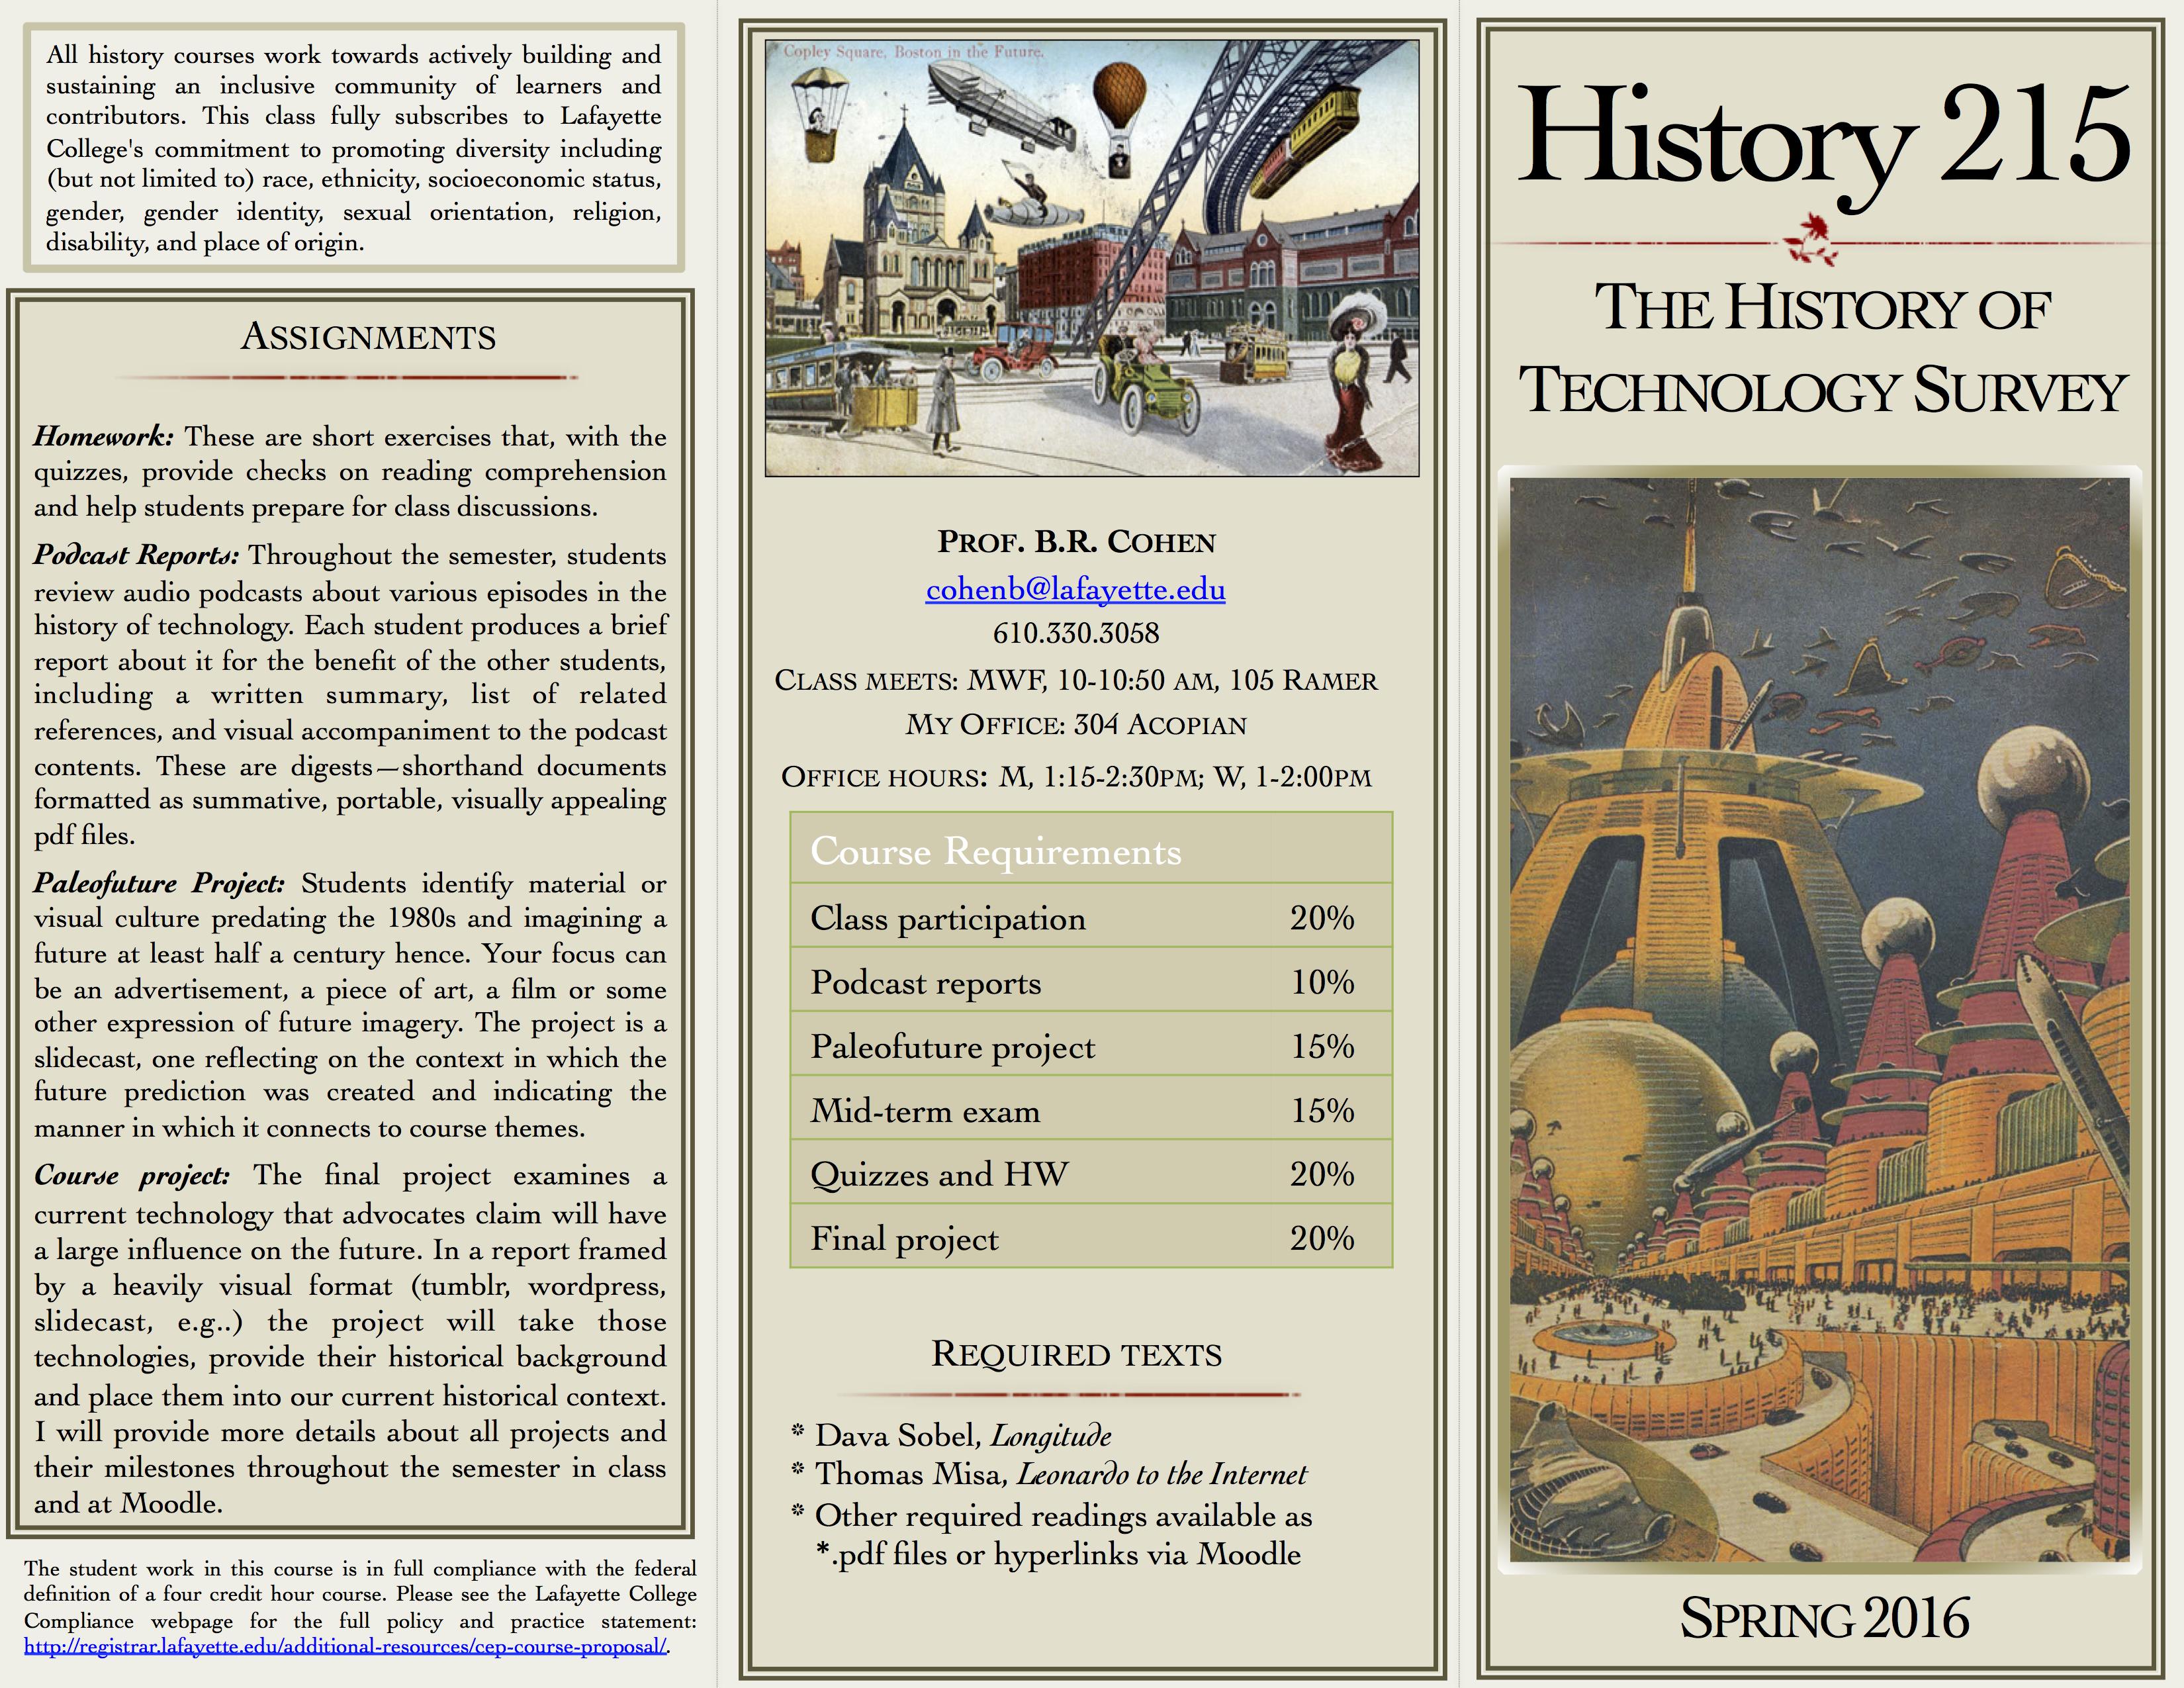 HIST 215 SP16 Course Overview